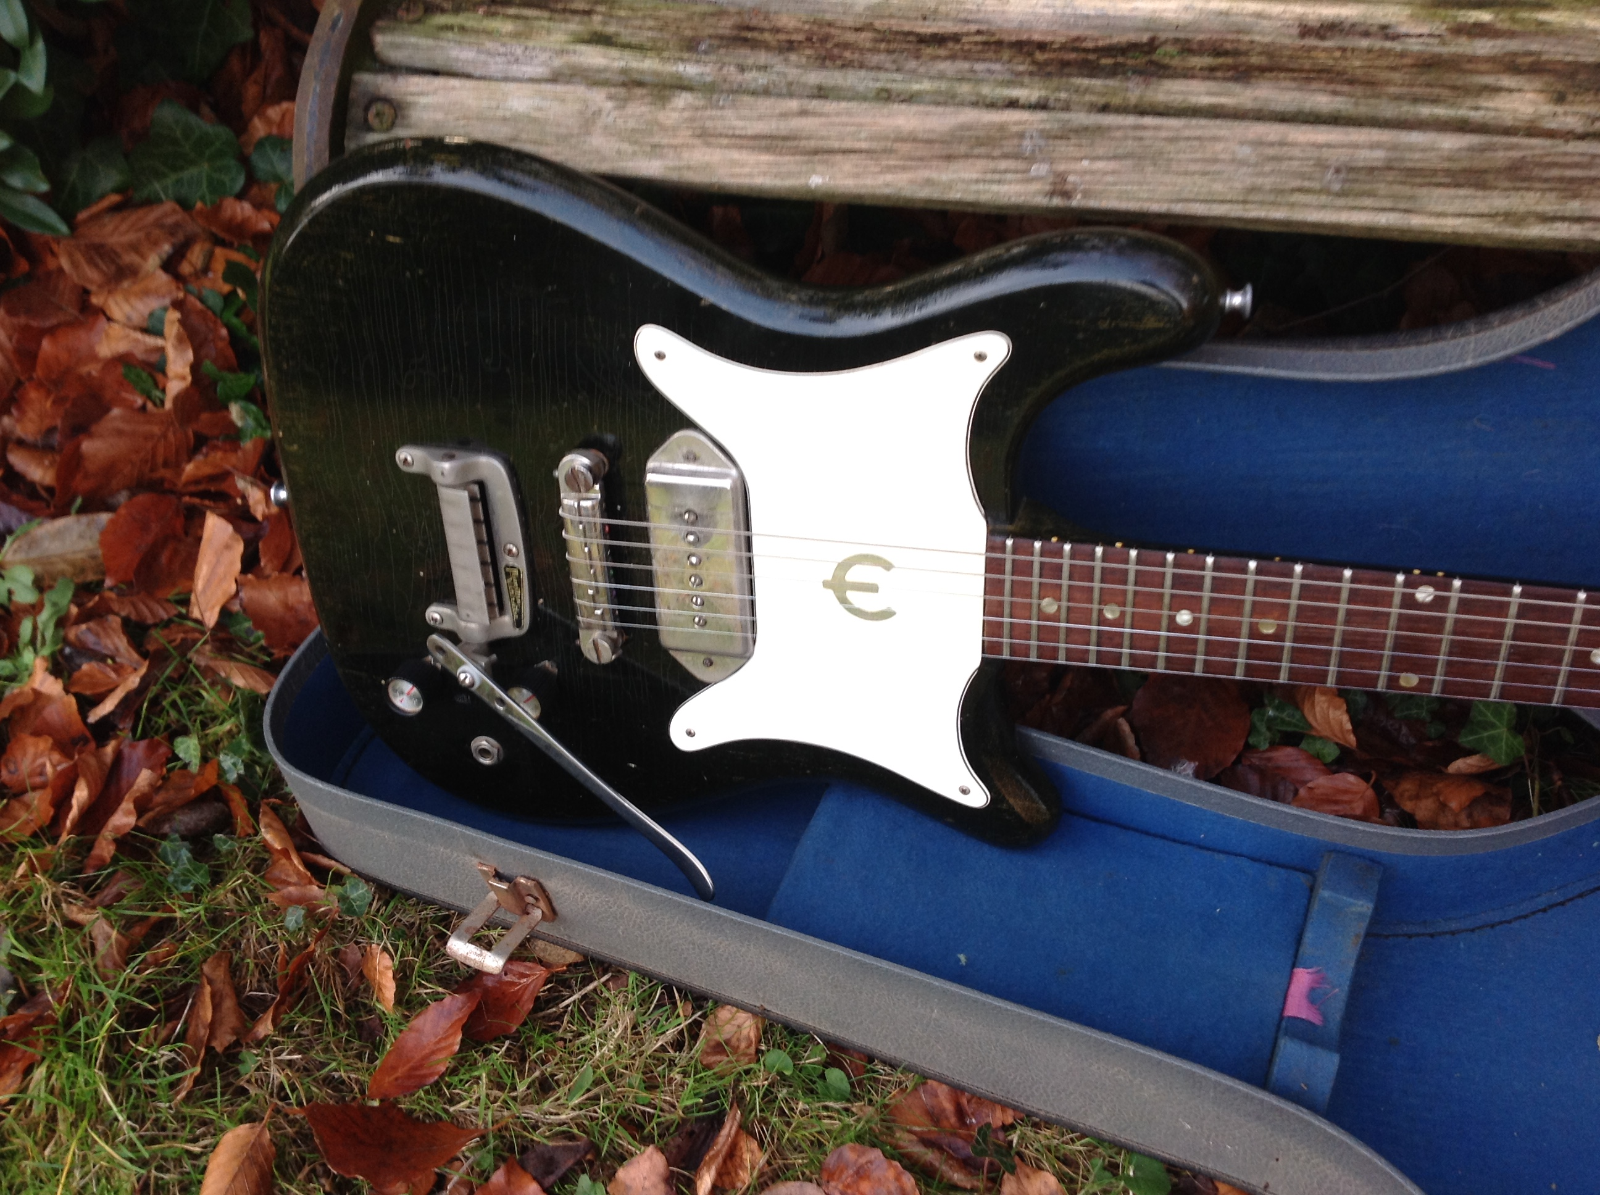 sf2 - Vintage & Modern Guitars